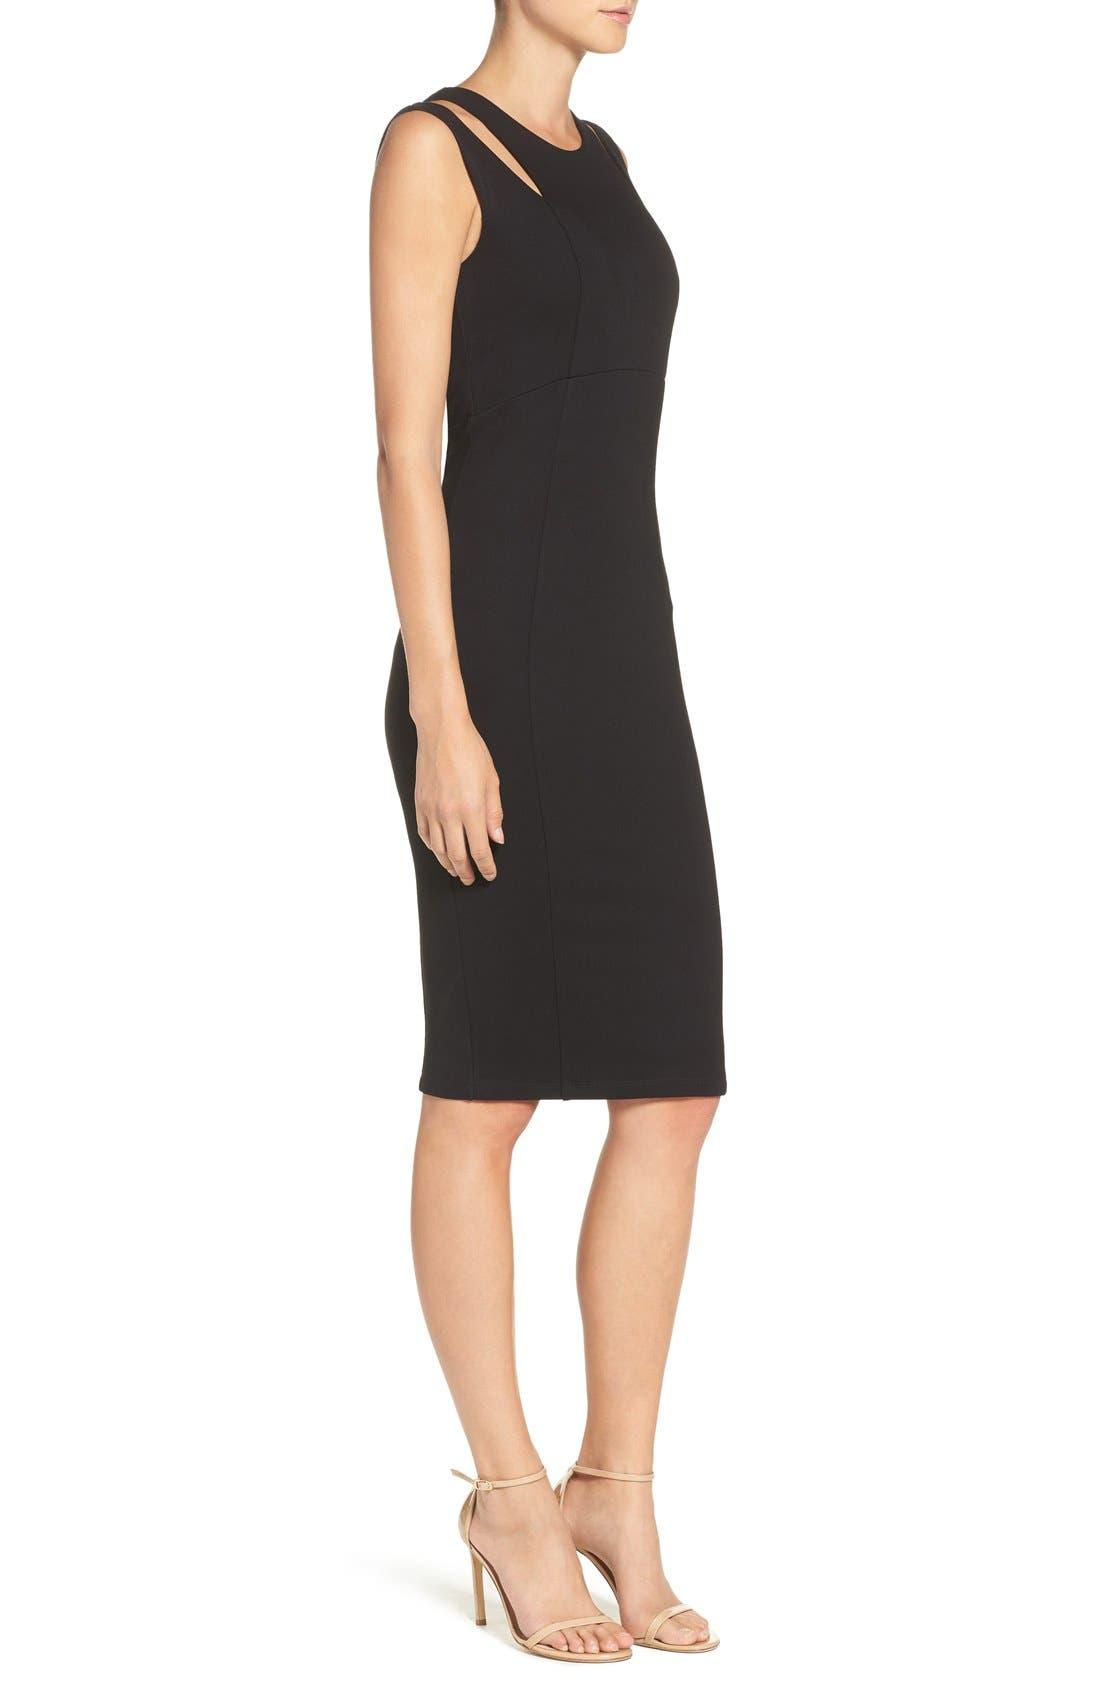 FELICITY & COCO, Shoulder Detail Ponte Sheath Dress, Alternate thumbnail 5, color, 001